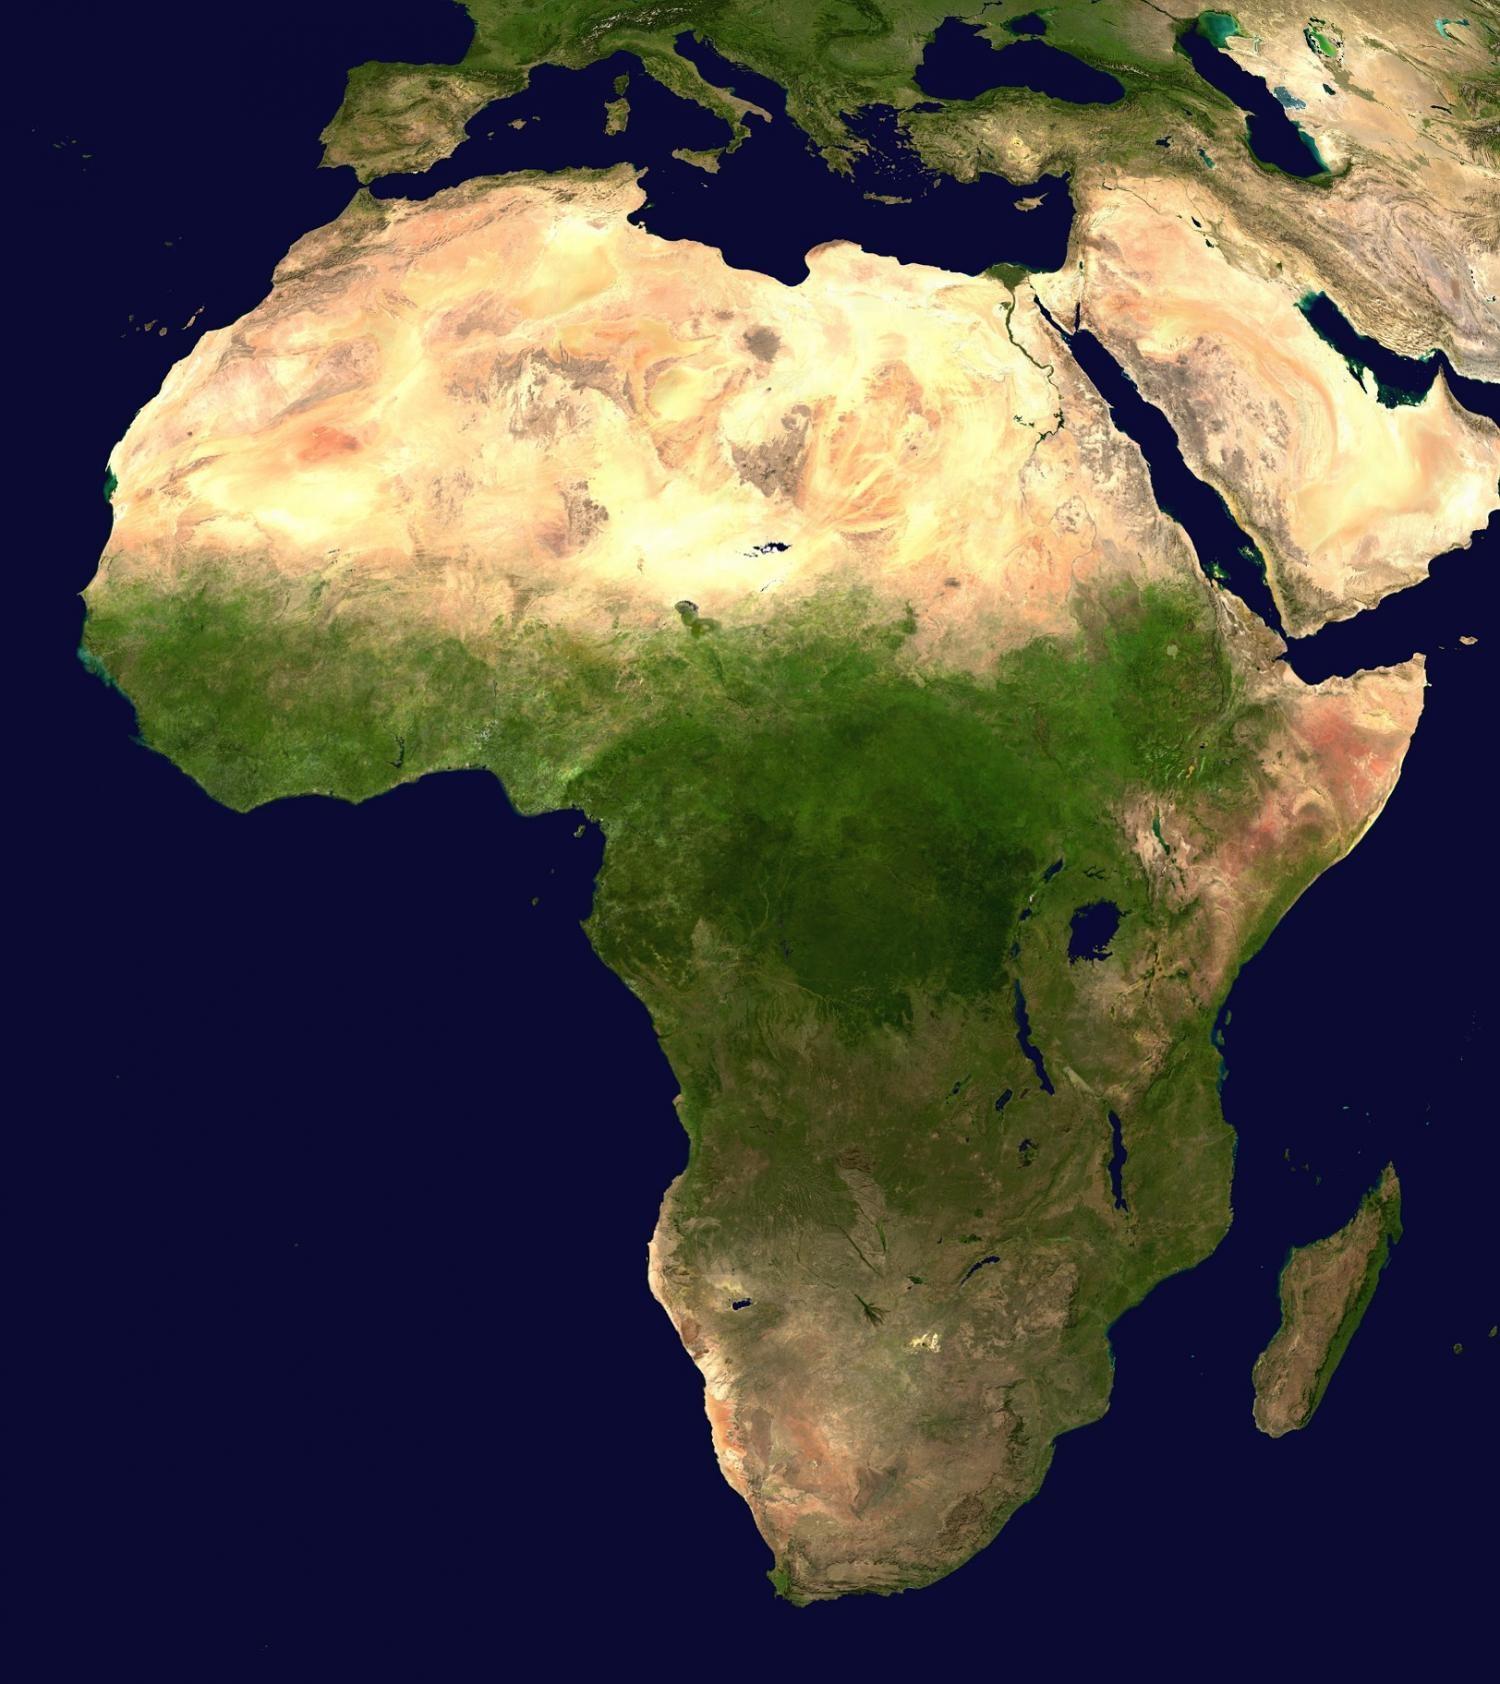 Afrika z pohledu satelitu.Kredit: Public Domain